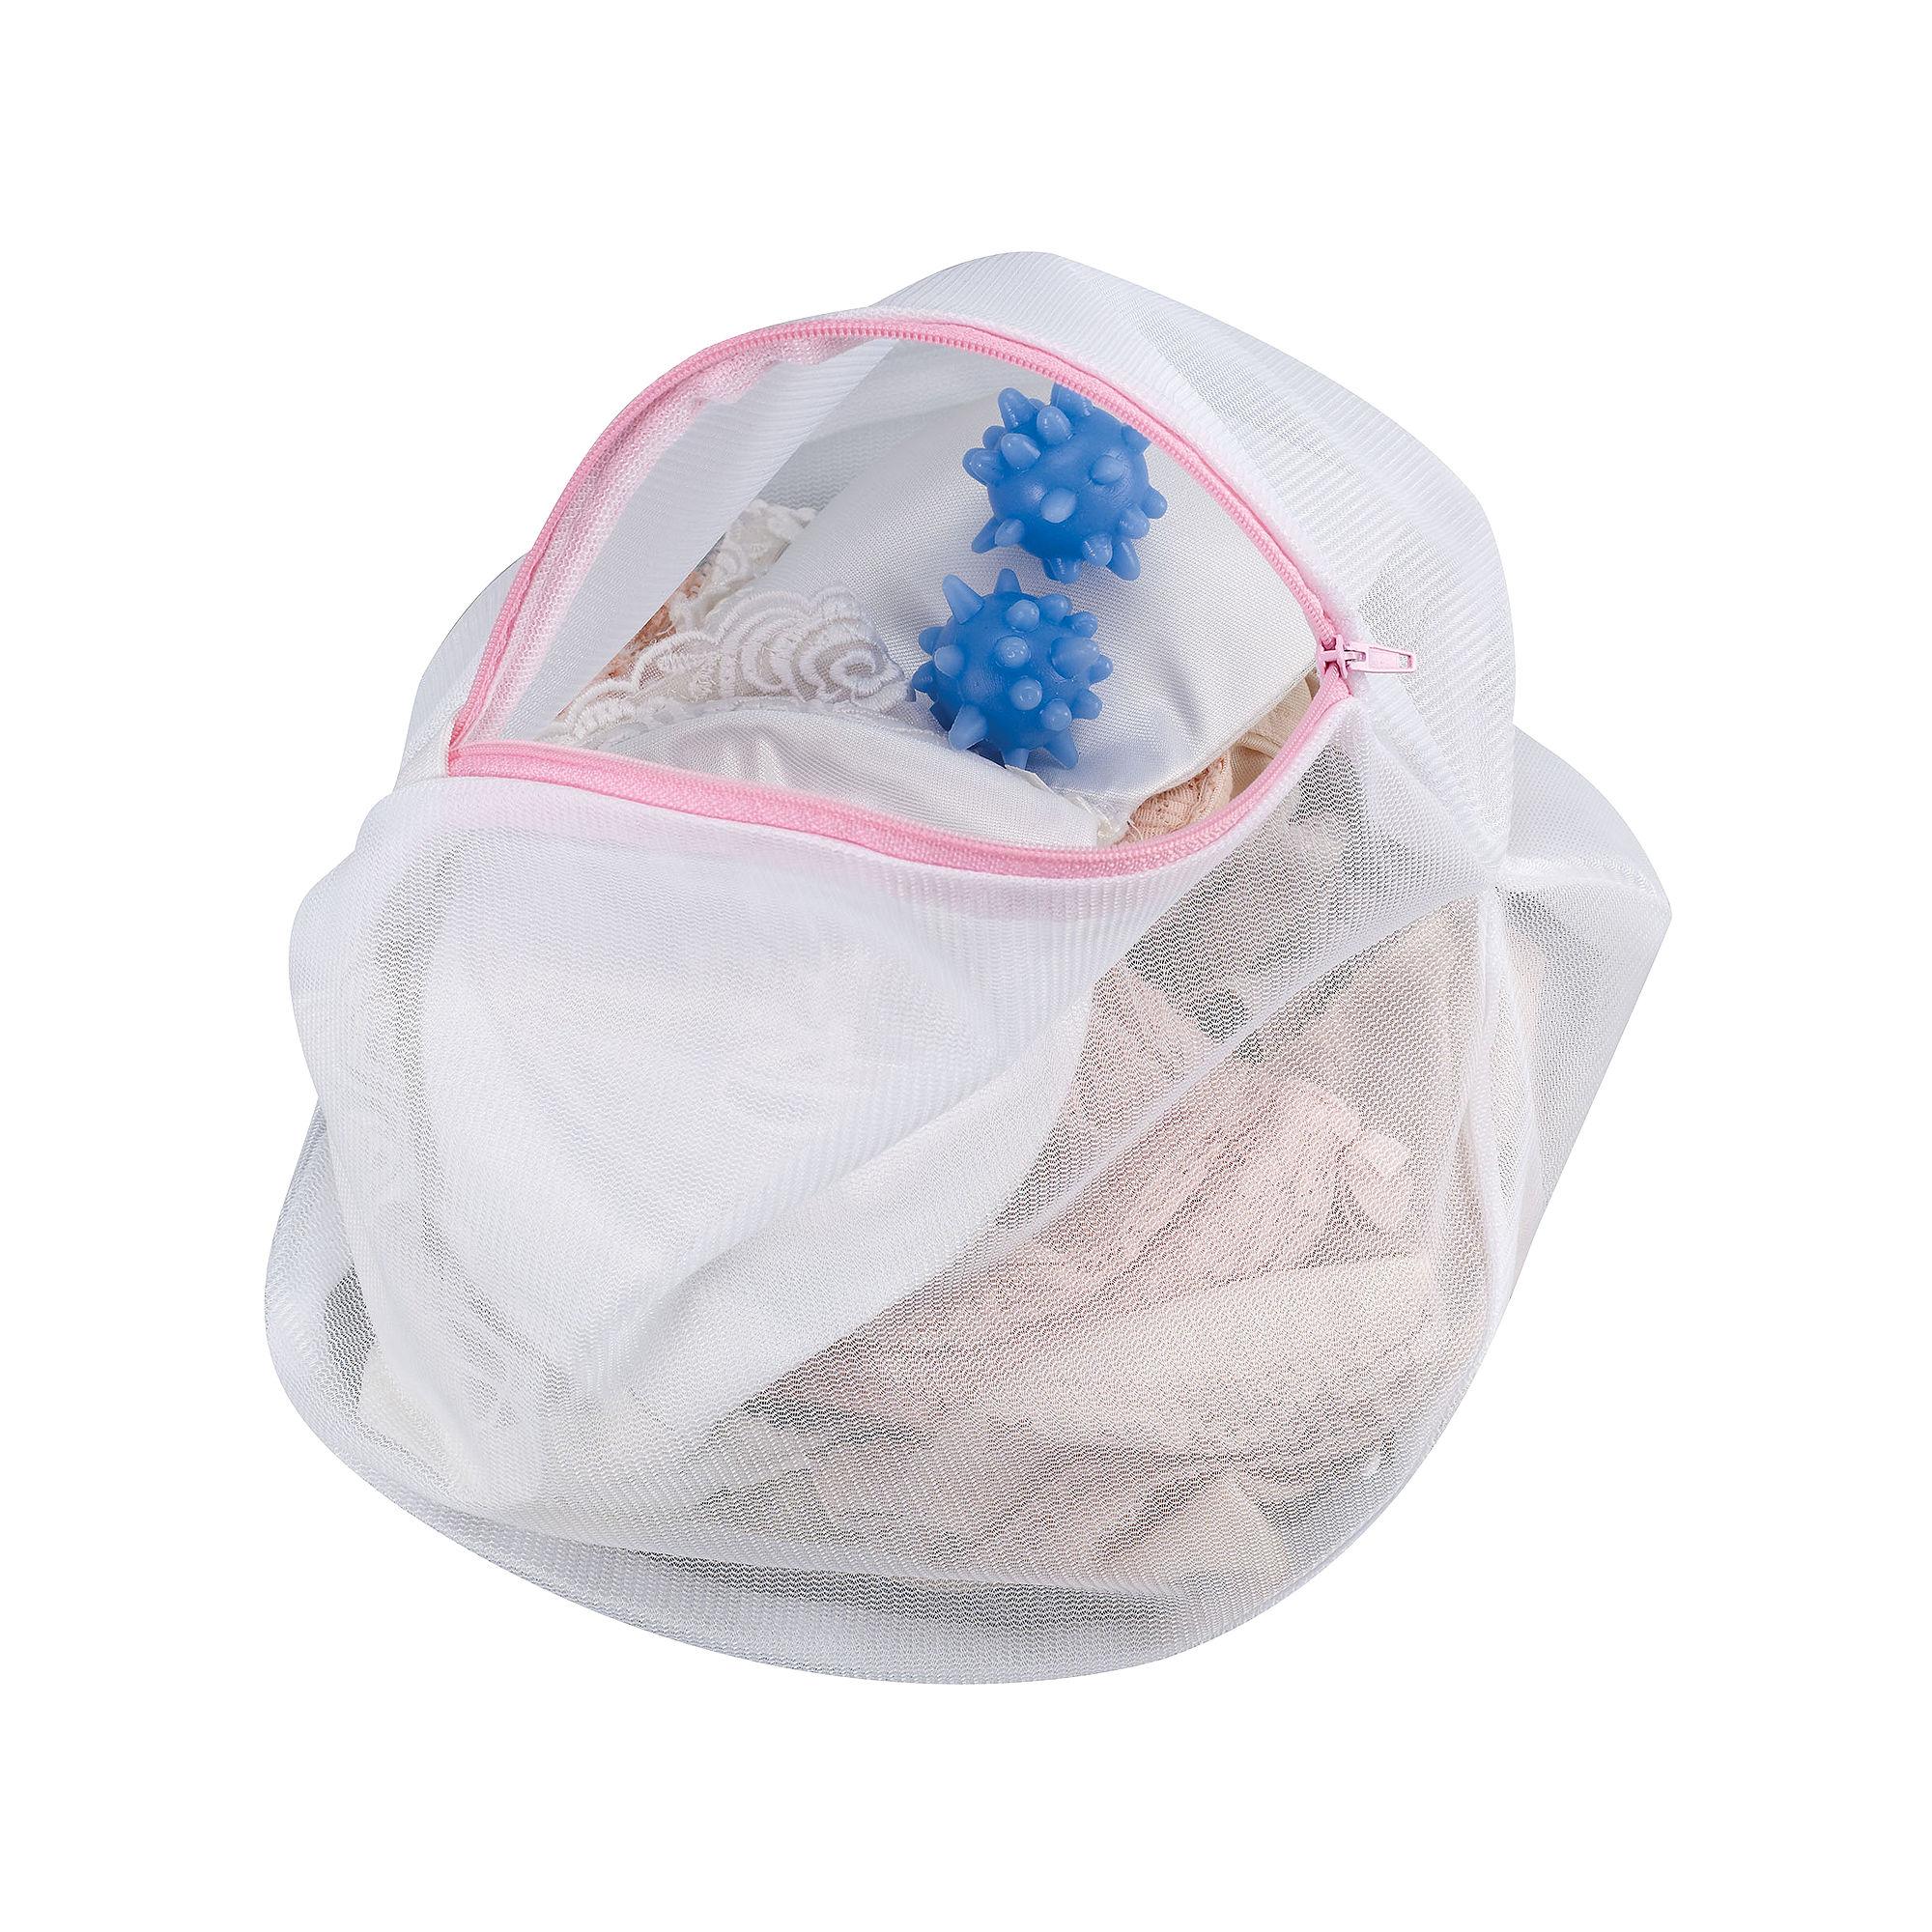 Household Essentials Lingerie Bag + Wash Balls